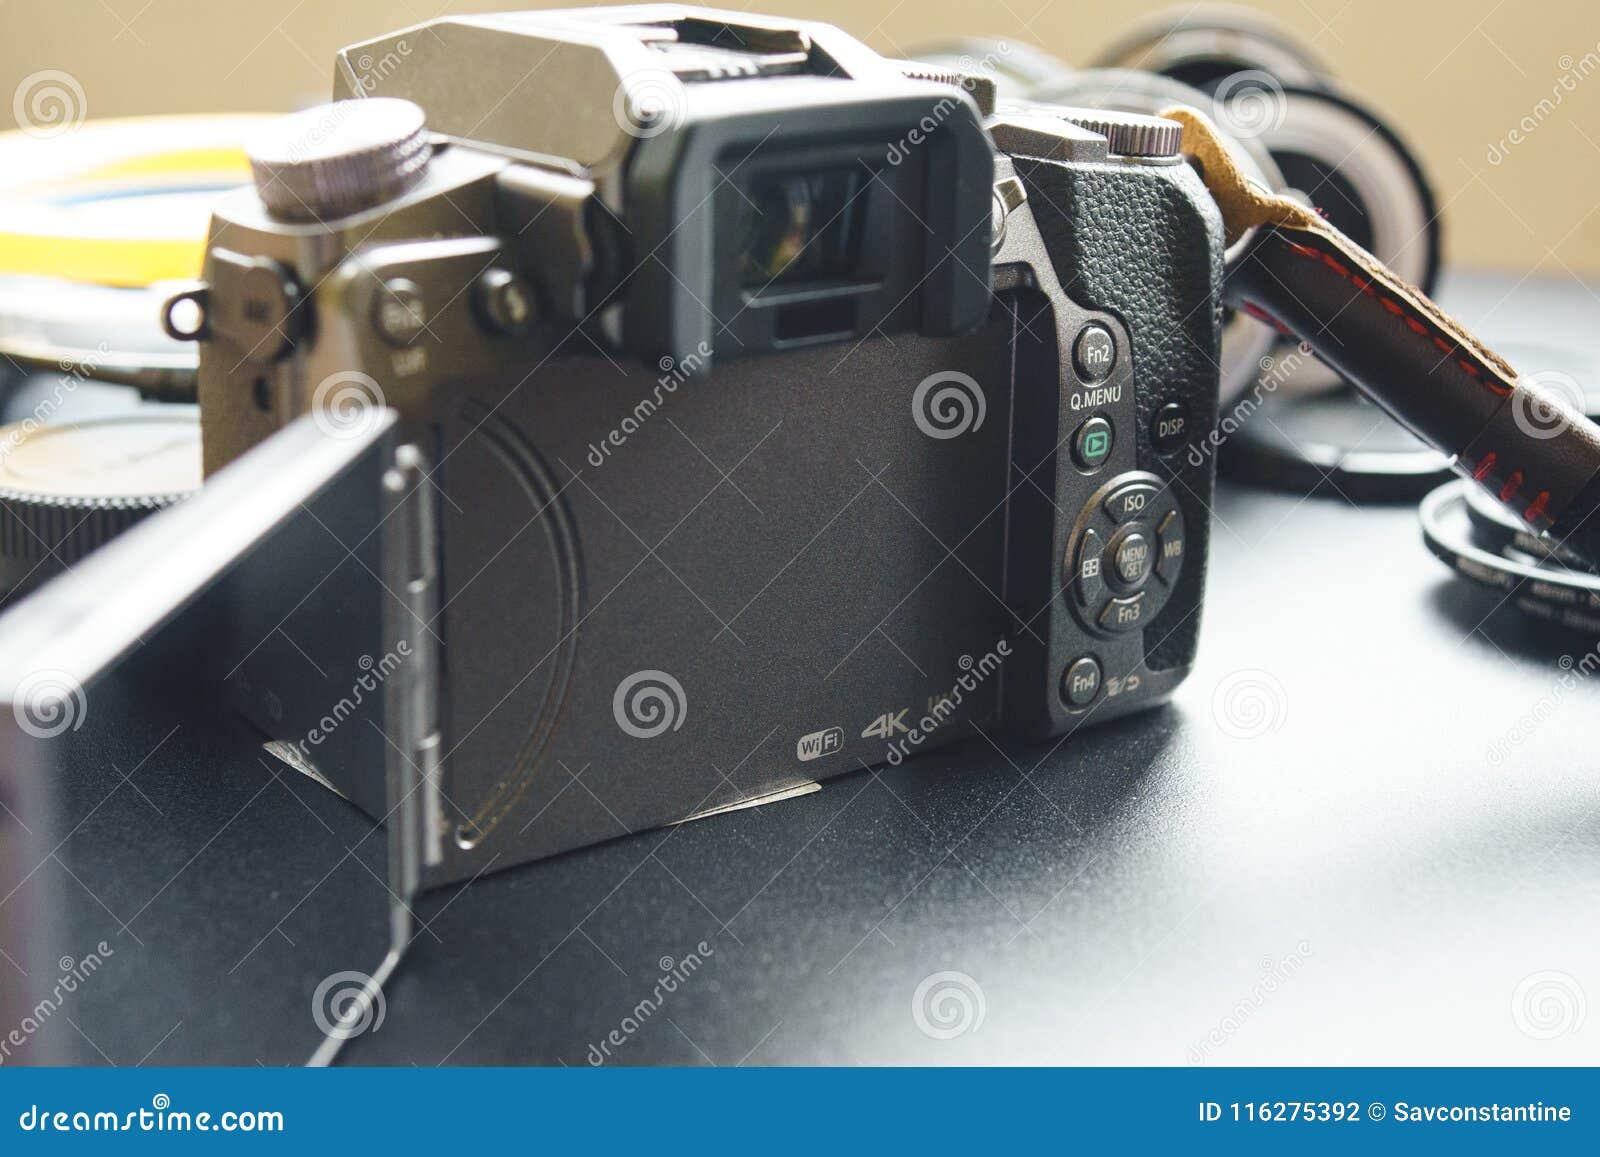 PANASONIC LUMIX G7 editorial photography  Image of video